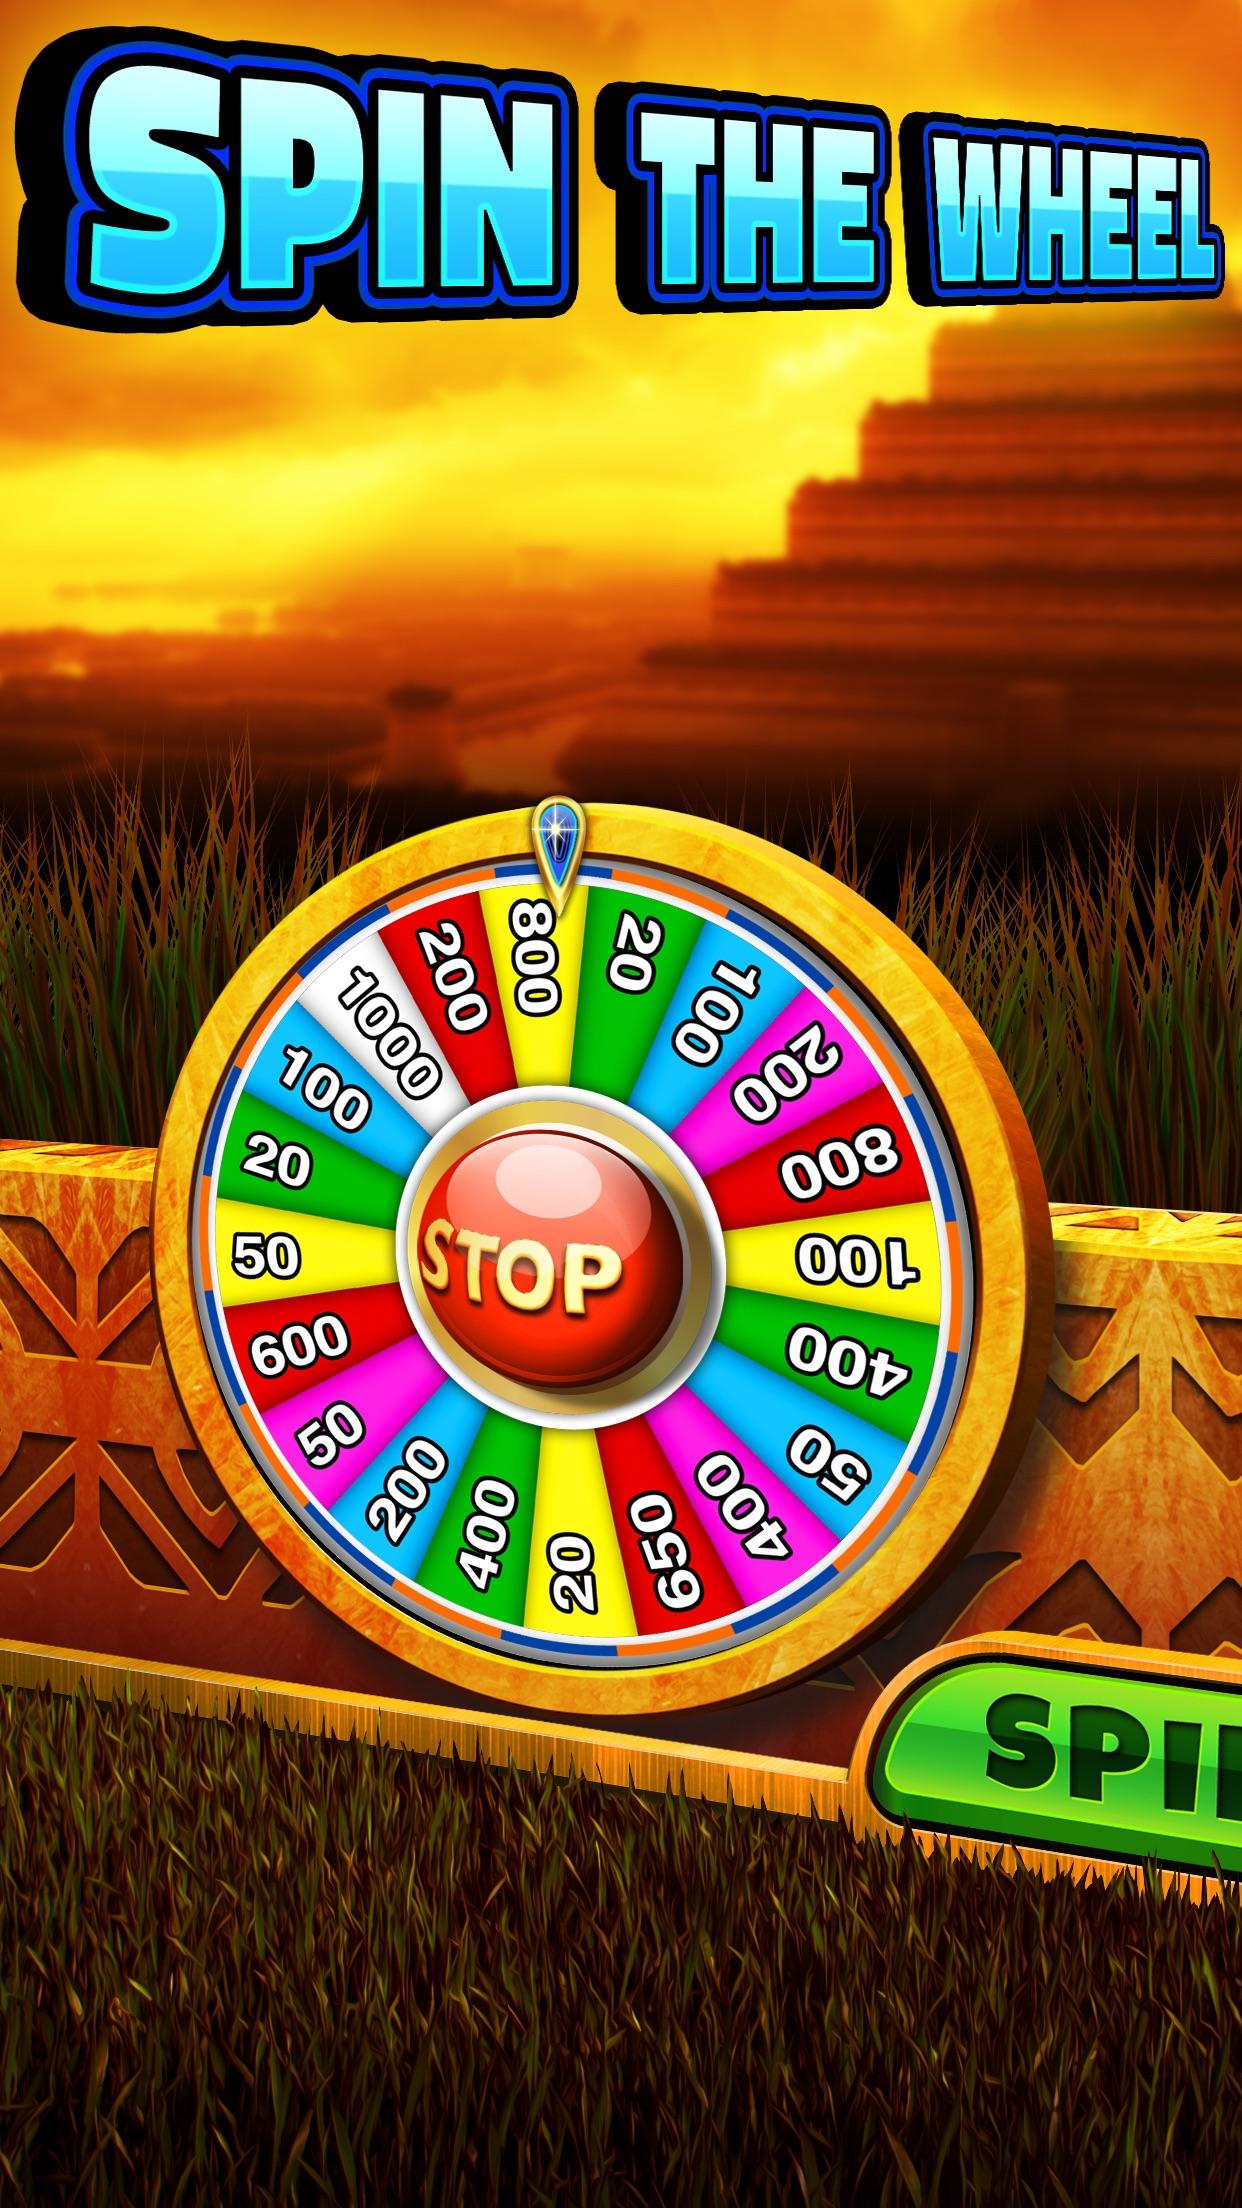 Slots Pharaoh's Gold 2 - FREE Slots your Way with All New Bonus Games in this Grand Cleopatra Casino! Screenshot